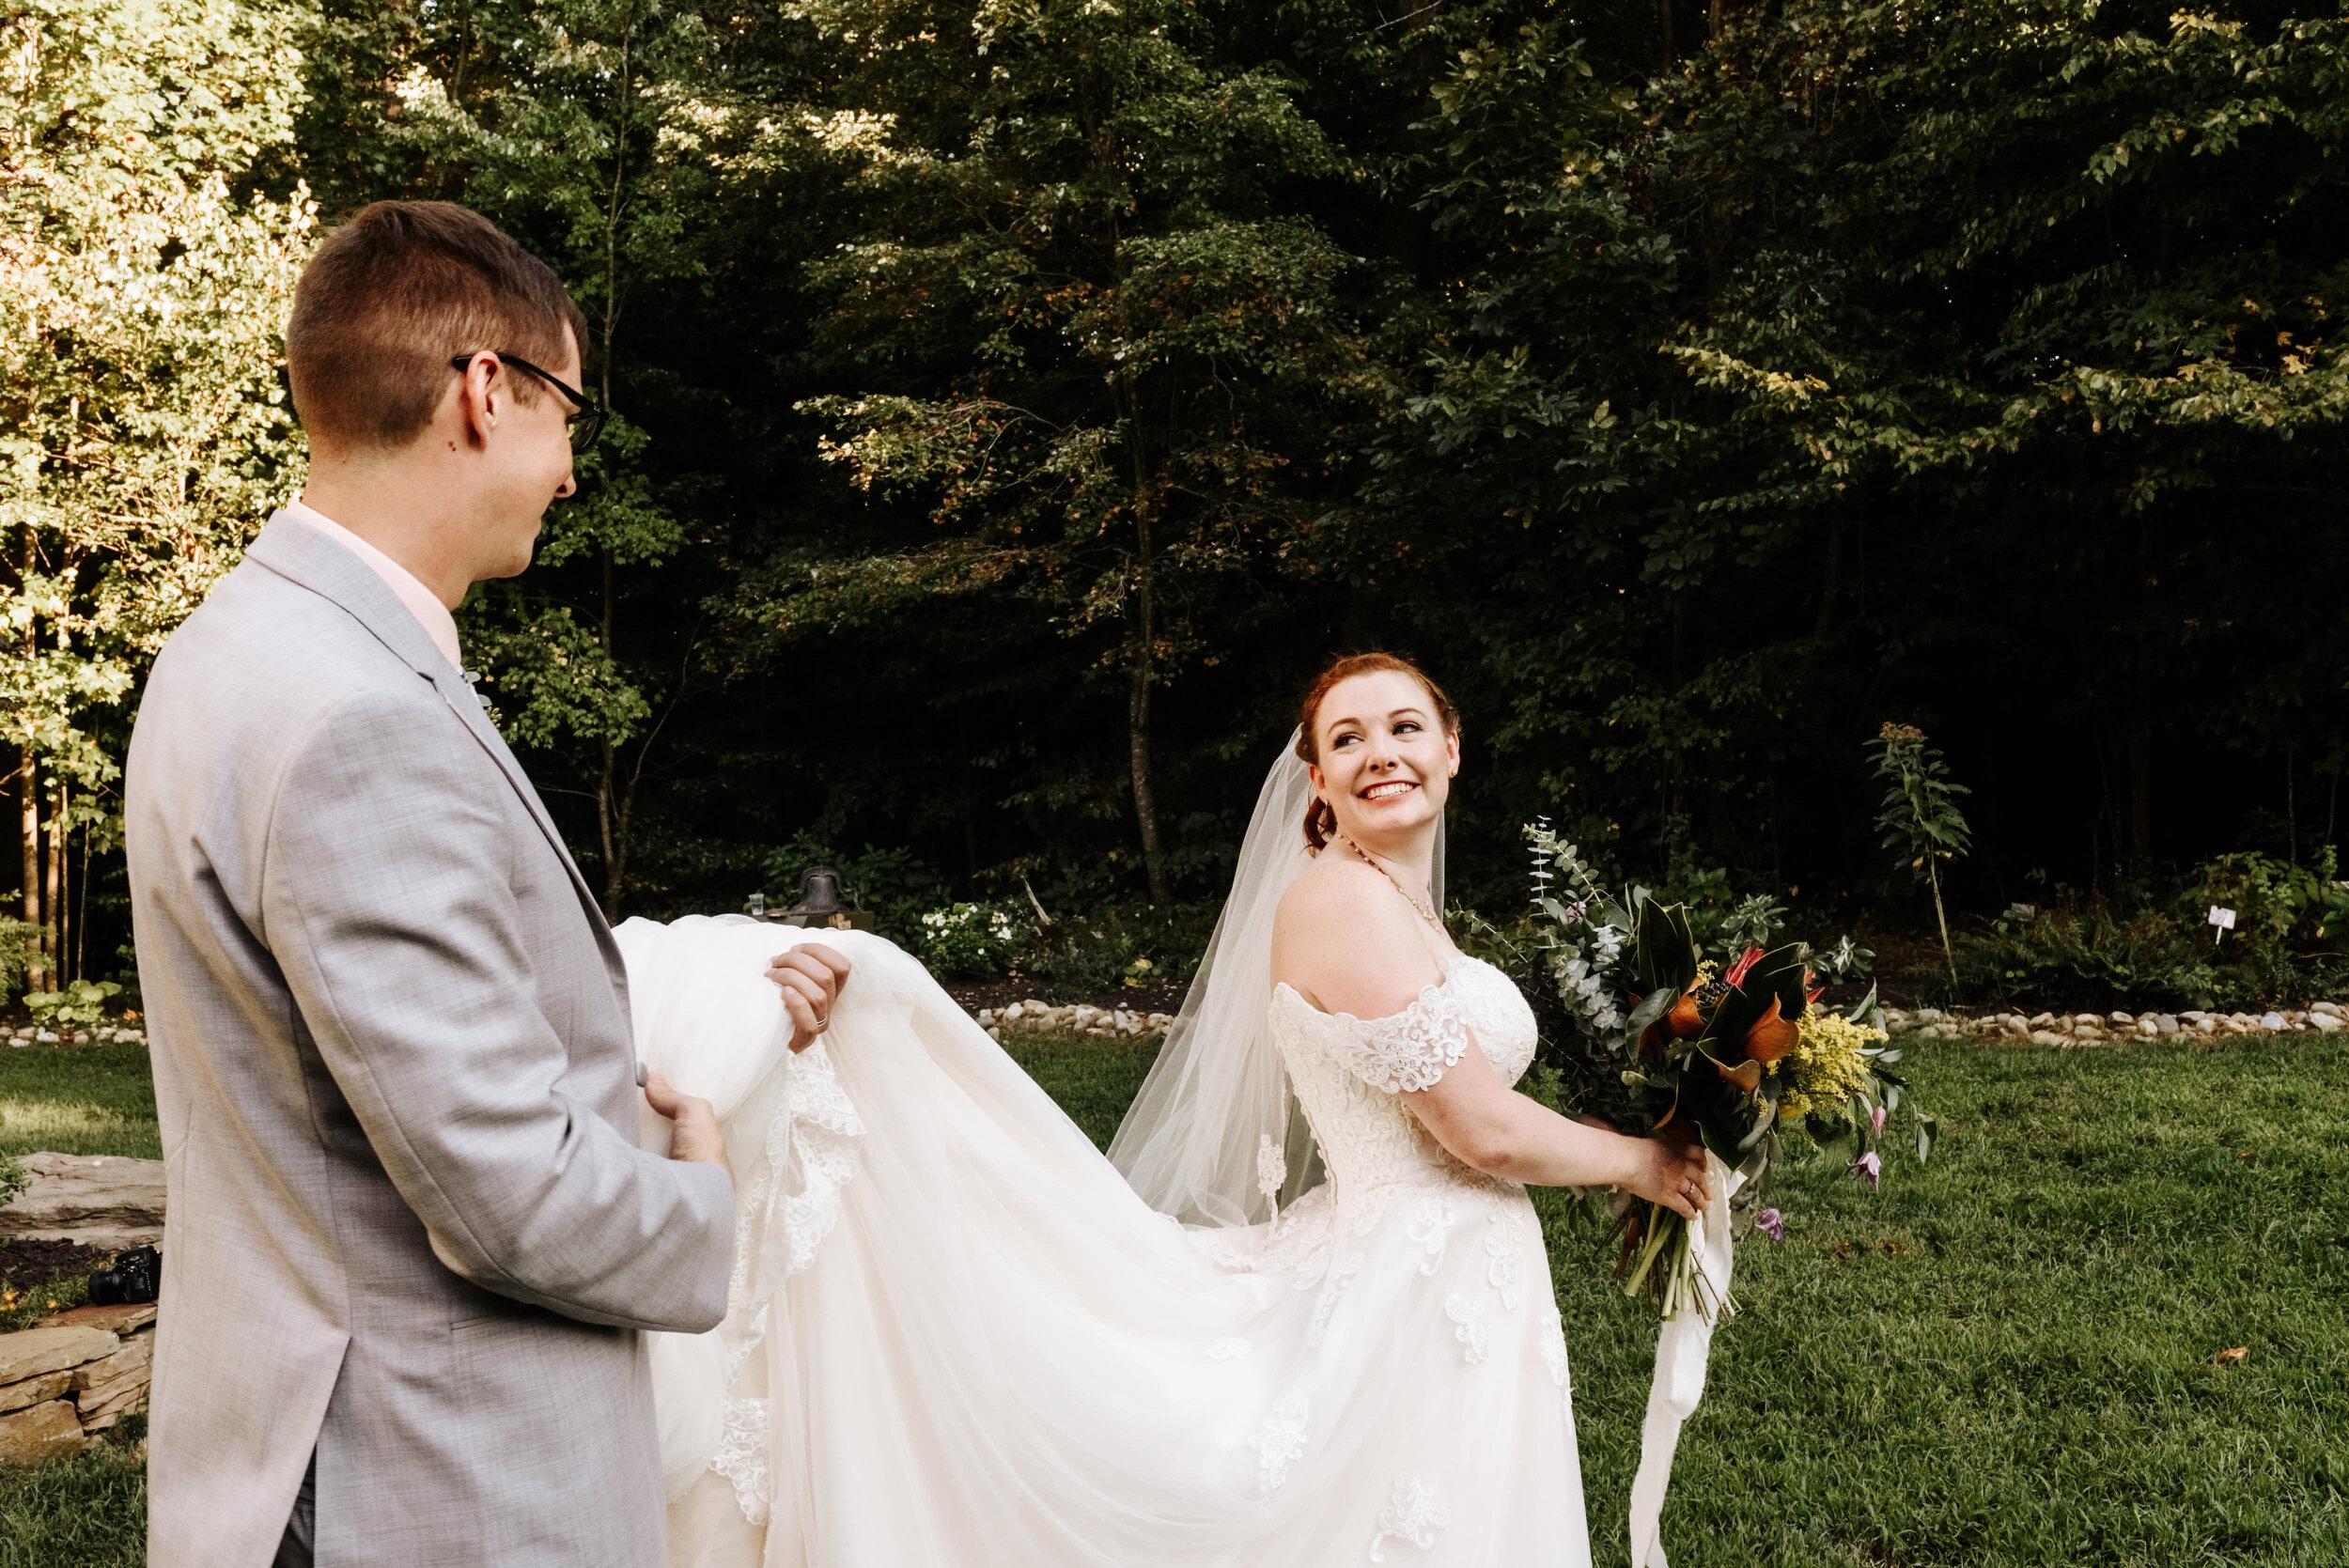 Rachel_David_Wedding_Richmond_Virginia_Photography_by_V_42.jpg